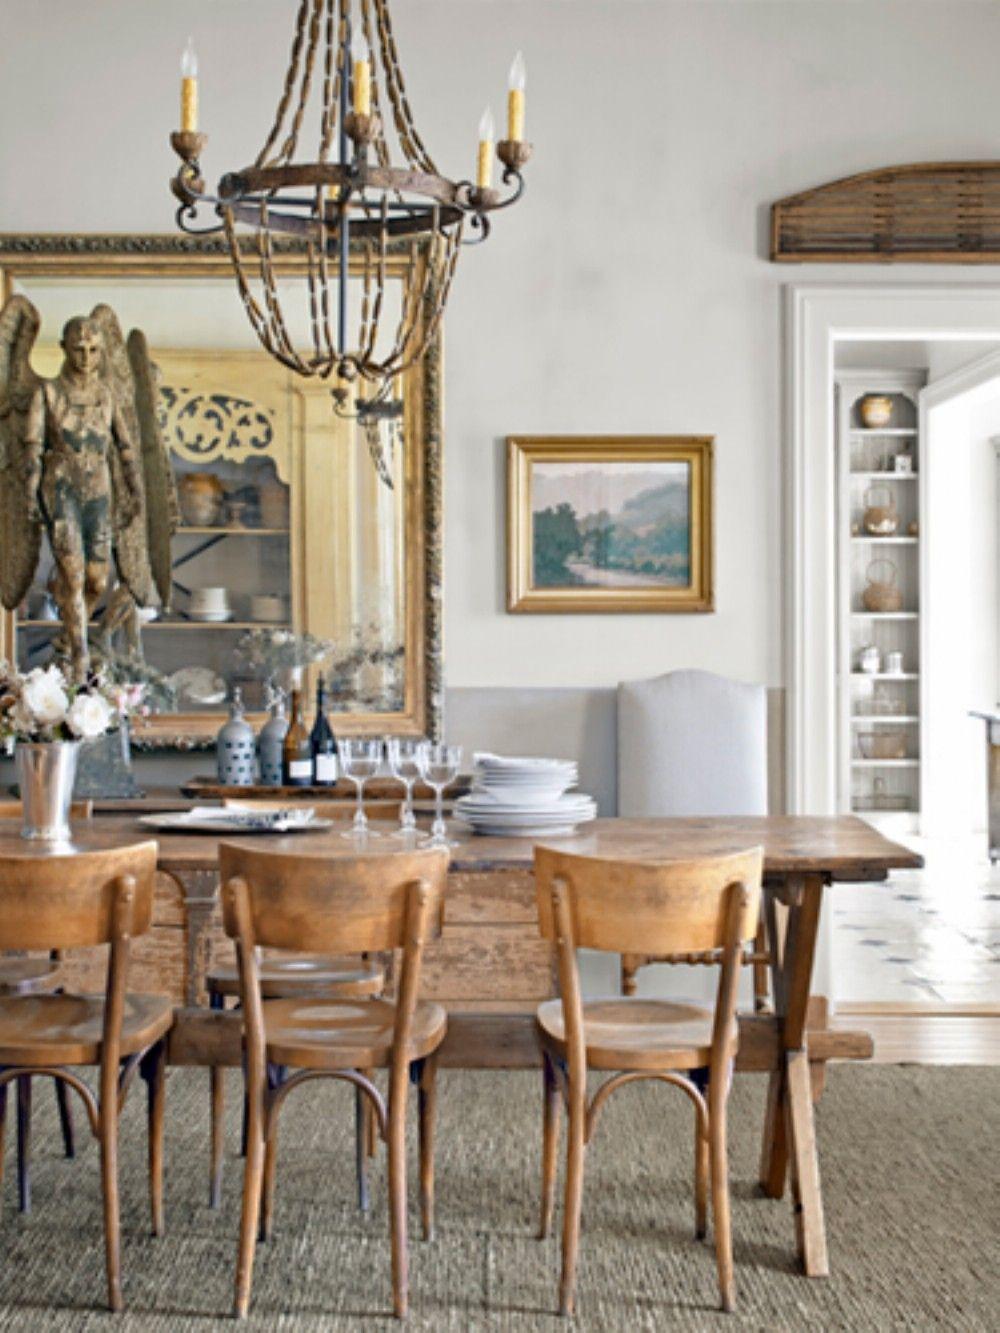 Amazing 50 Victorian Farmhouse Dining Room Interior Design Ideas Cooarchitecture